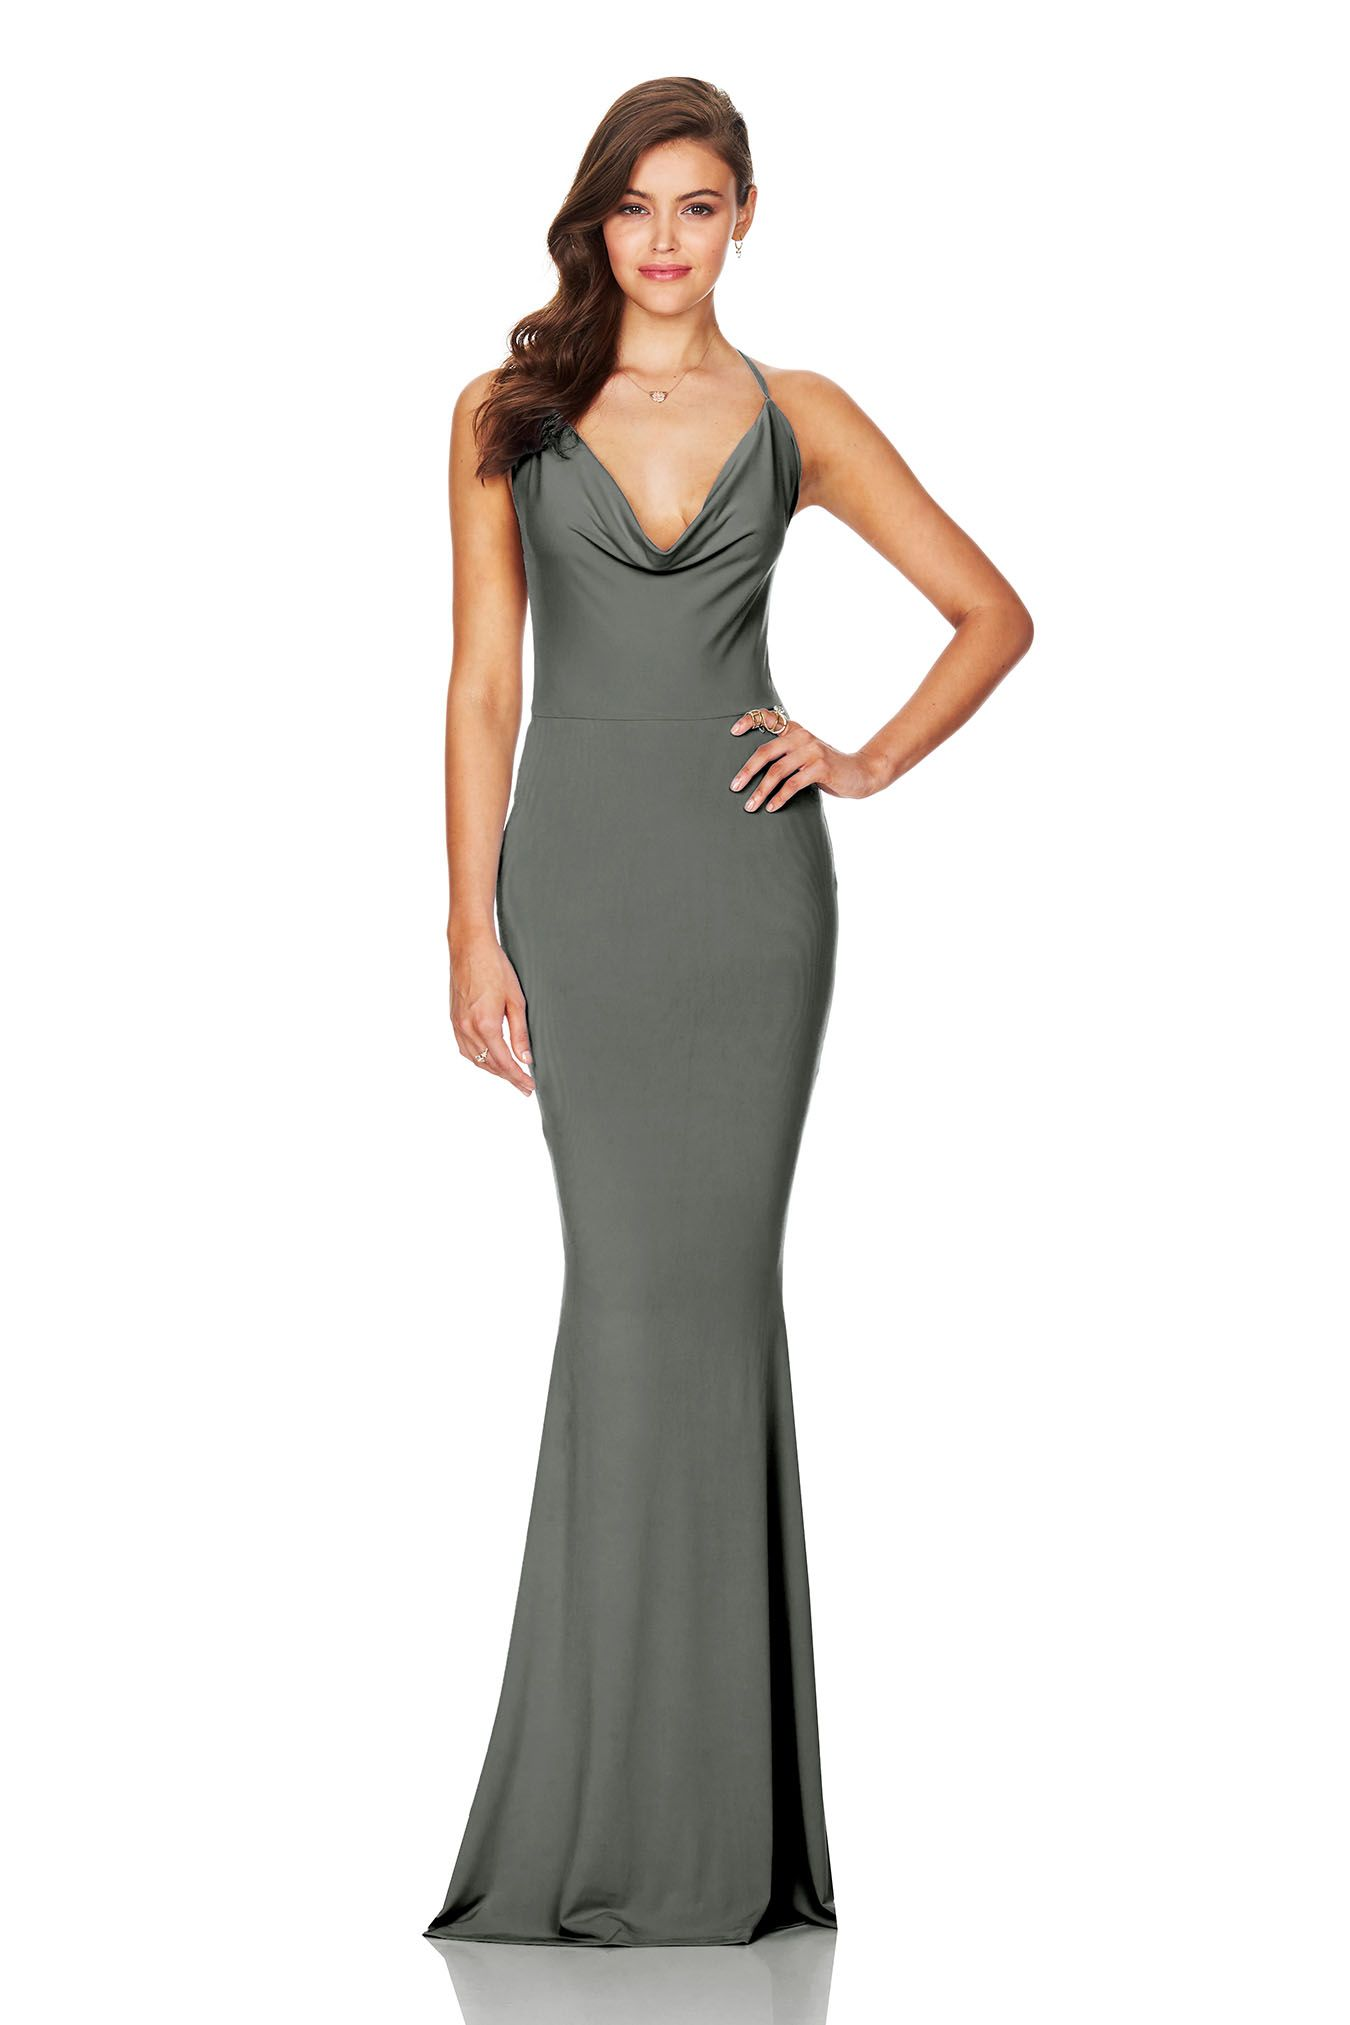 Hustle Maxi Dress Olive (PREORDER) | Maxi dresses, Body con and ...